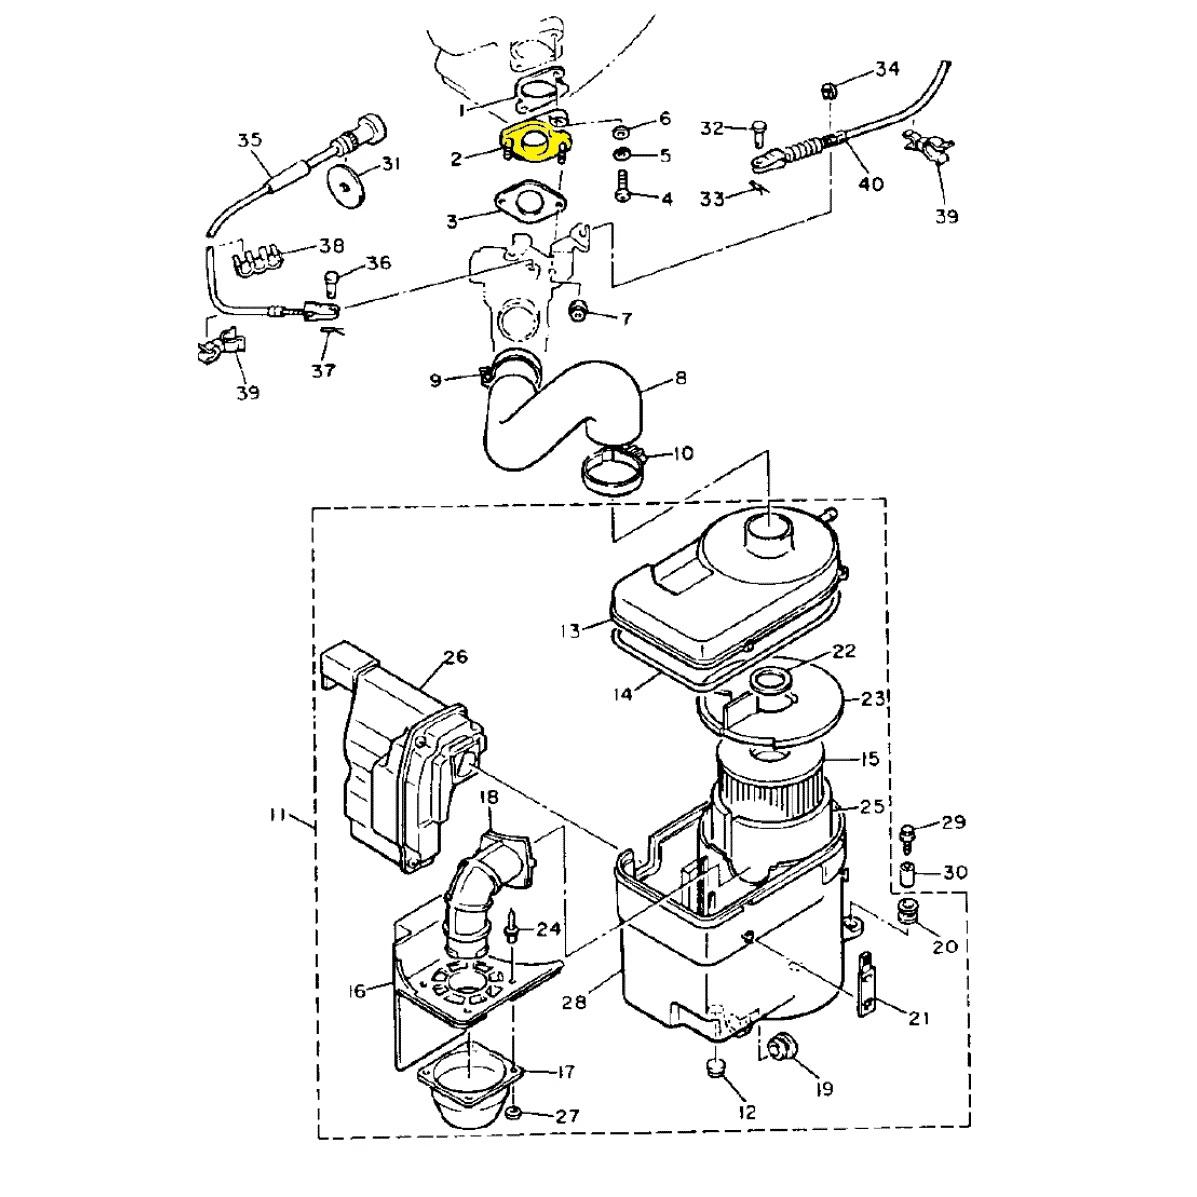 Ybr 125 Engine Diagram Auto Parts Catalog And 97 Rt100 Carb Yamaha 2stroke Thumpertalk Fuse Box